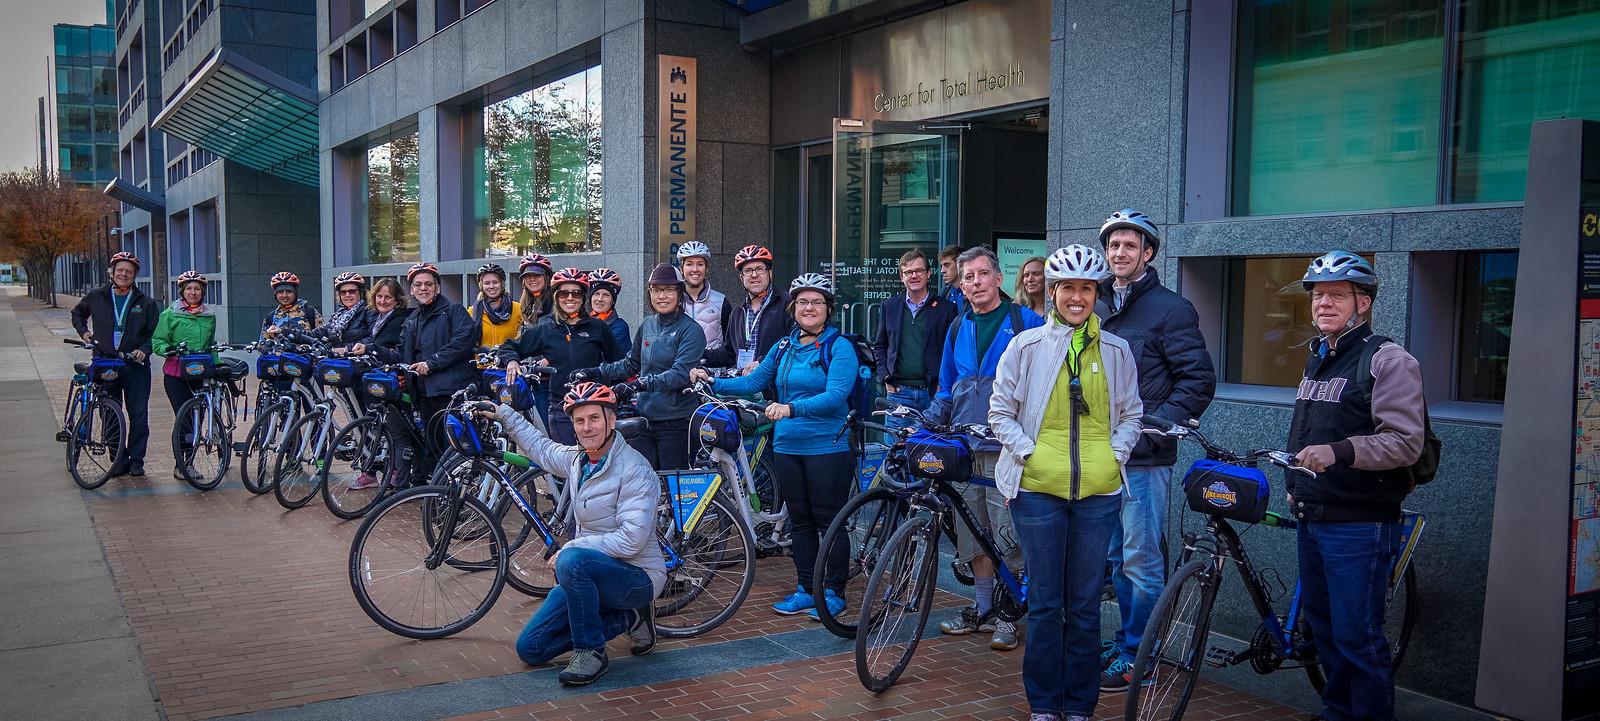 2015 Greenbuild Tour Bike DC- Transit, Health, and Gardens Kaiser Permanente Center for Total Health  00238